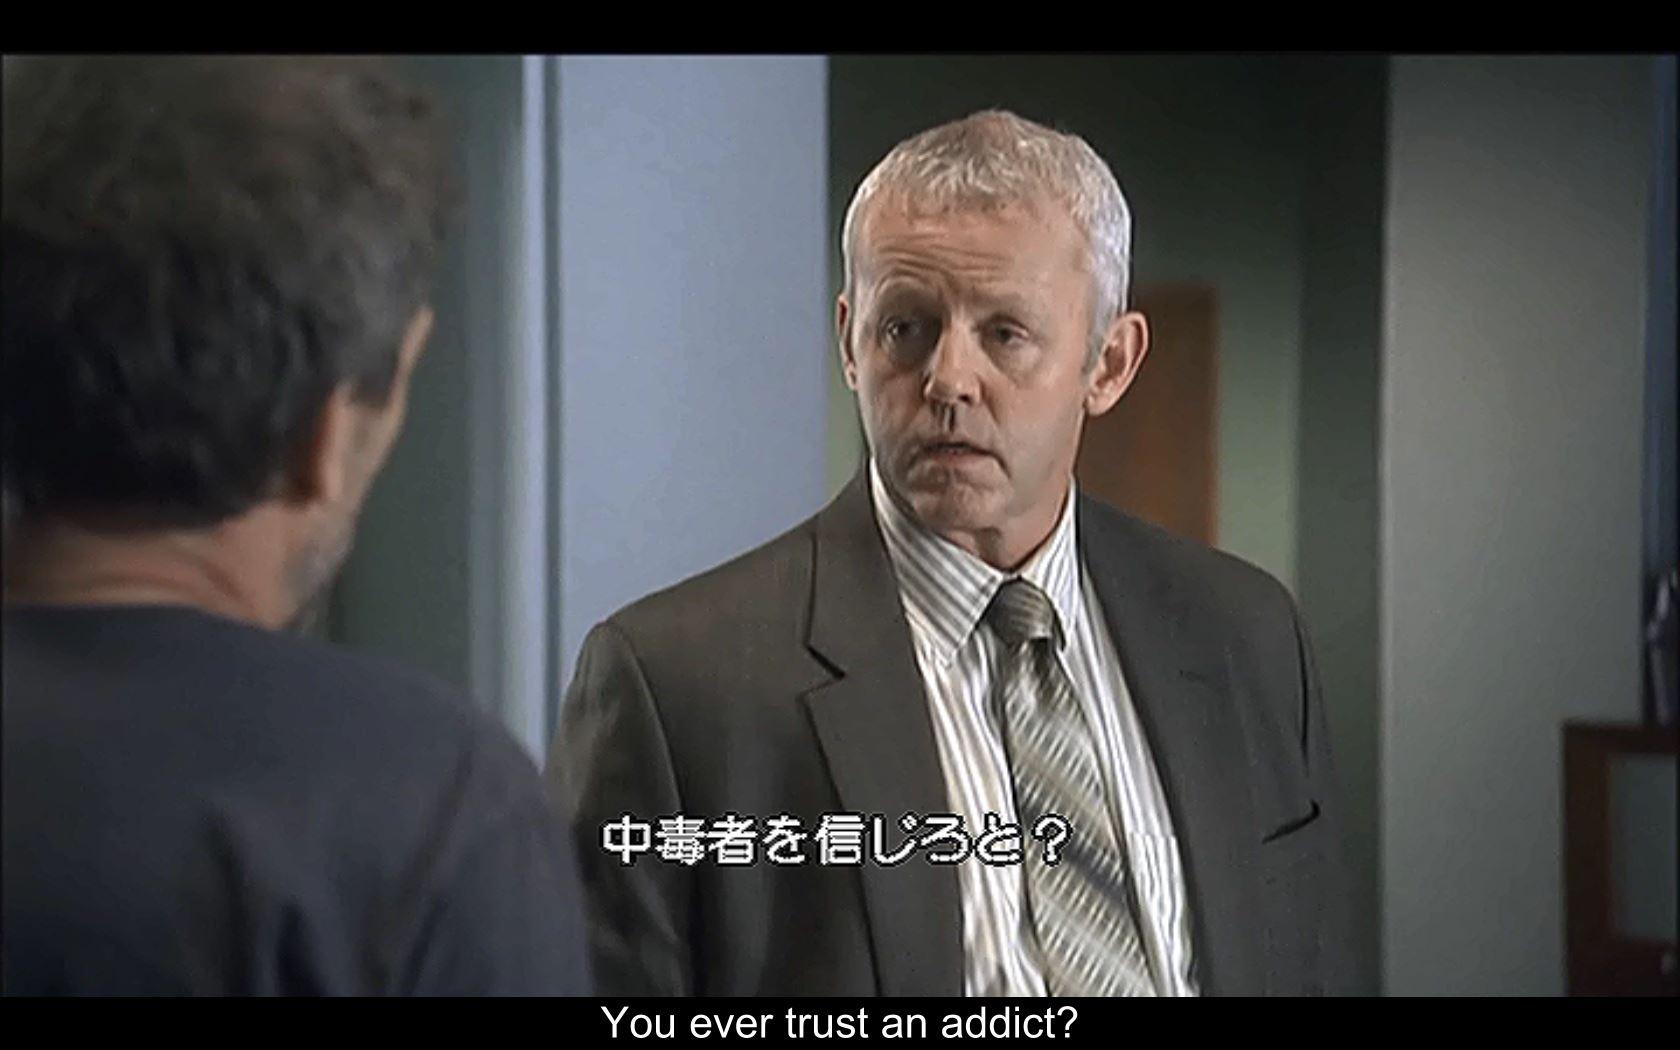 「Dr. HOUSE」シーズン3の11話(take it out onなど)